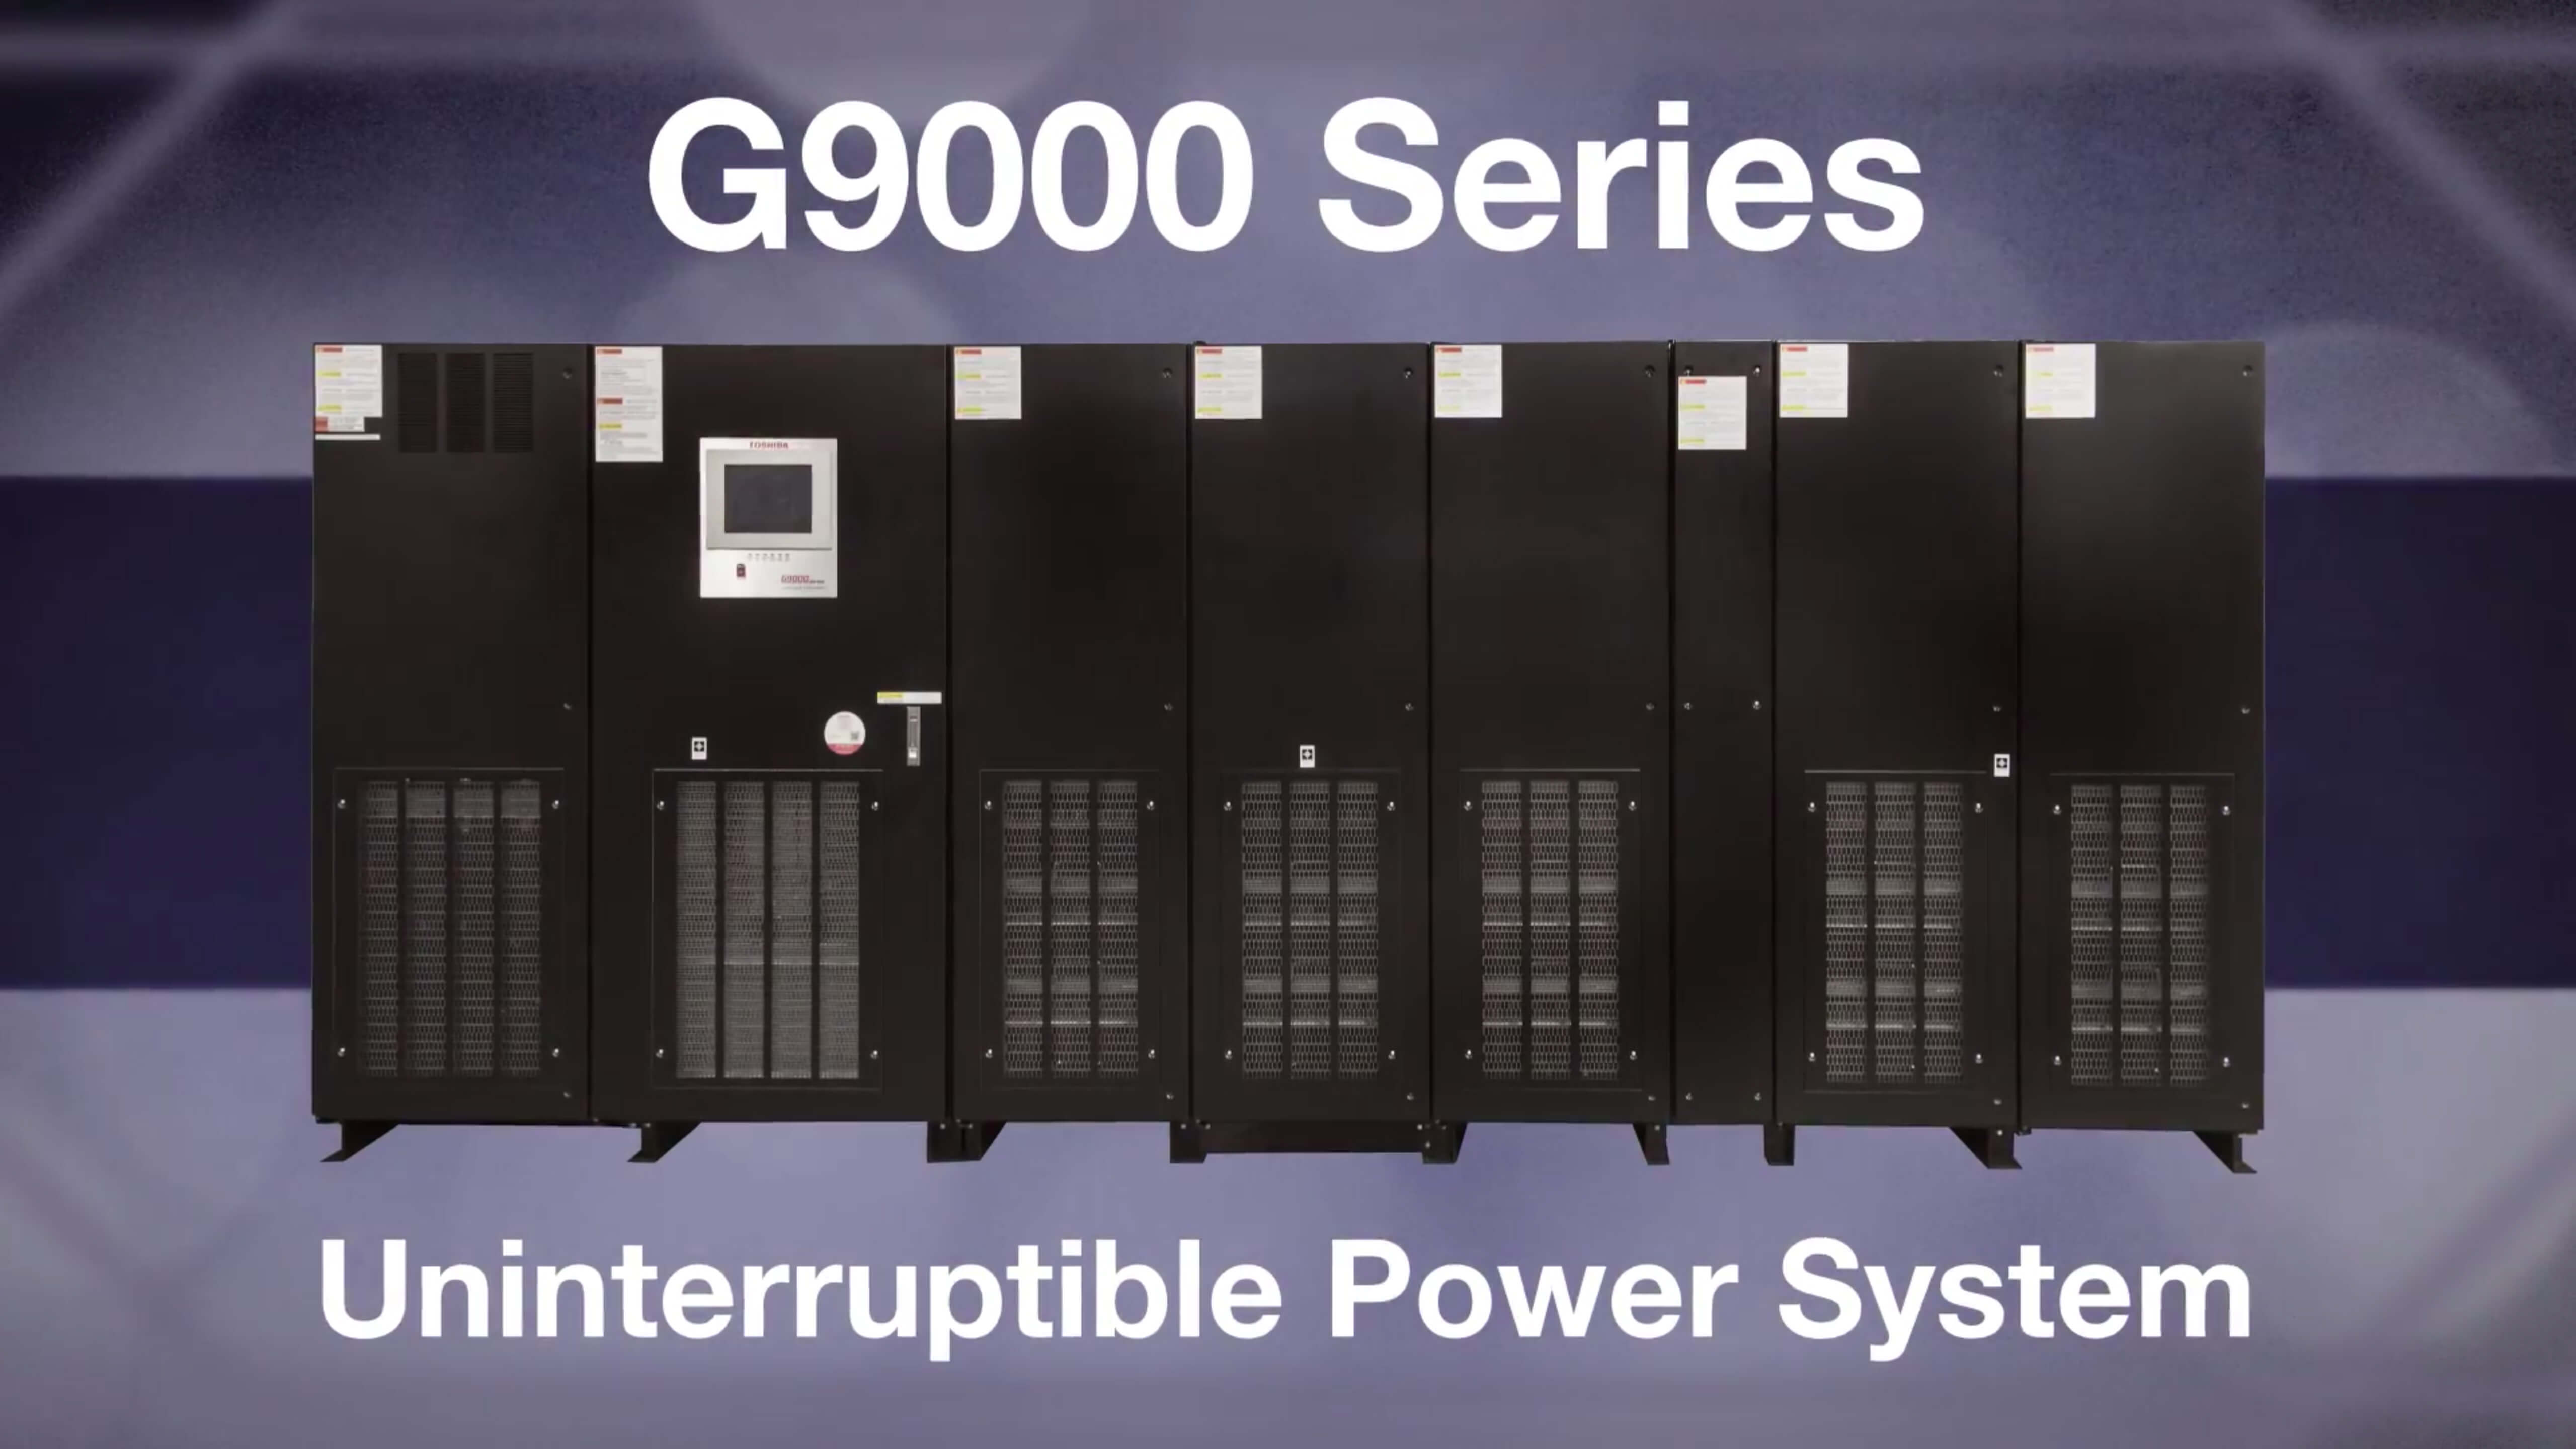 G9000 Series 100 to 2000 kVA | Power Electronics | Toshiba